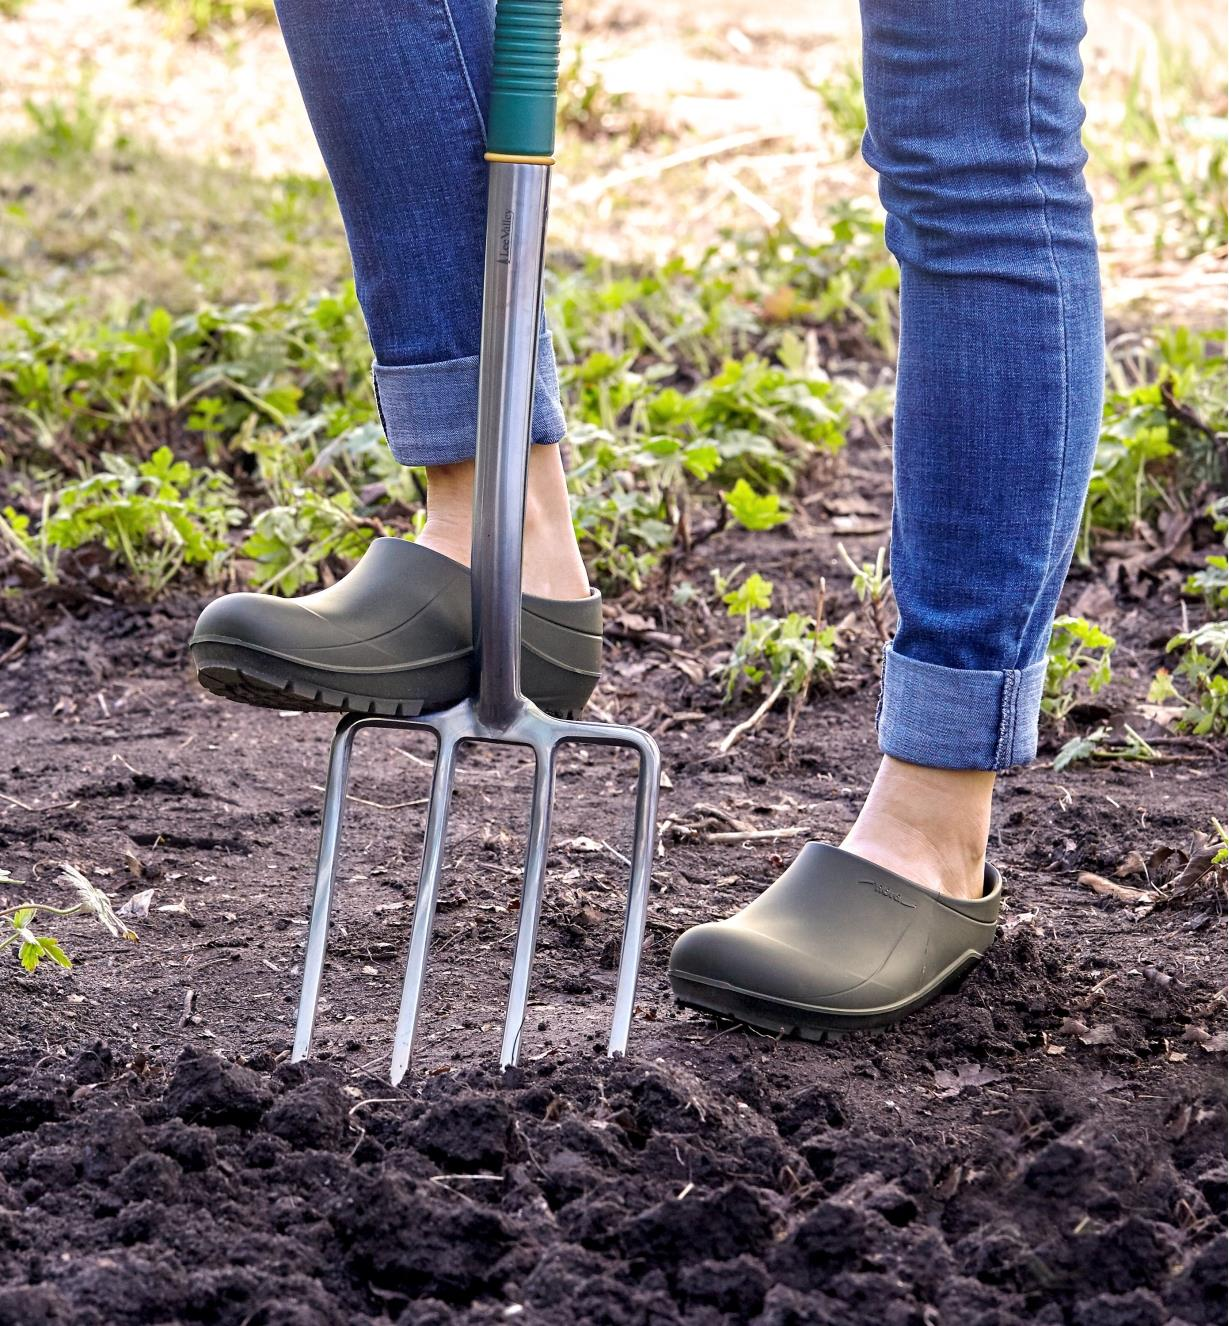 A woman wearing European garden clogs bears down on a garden fork to drive it into the soil